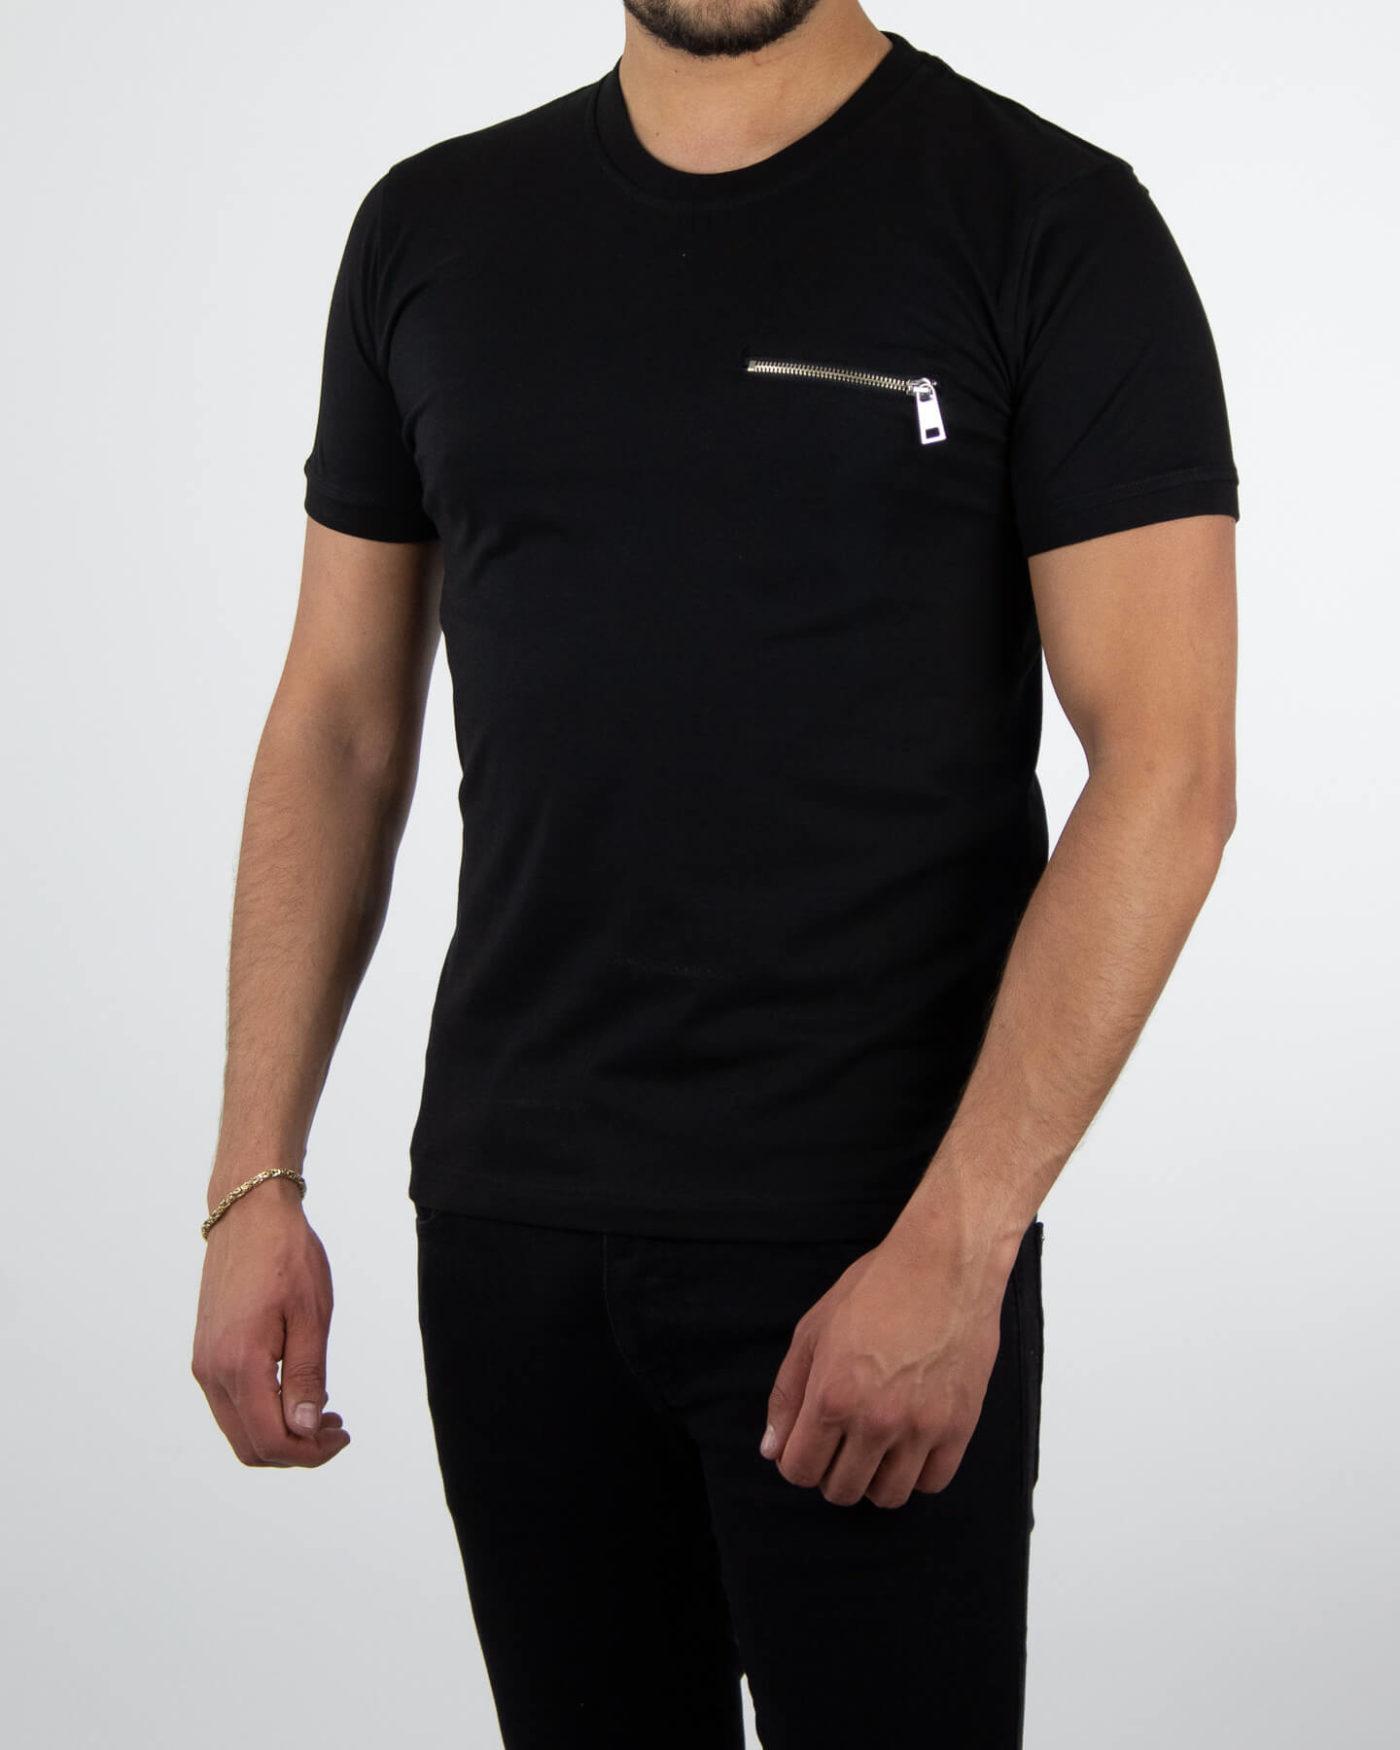 Rico Black Shirt-1